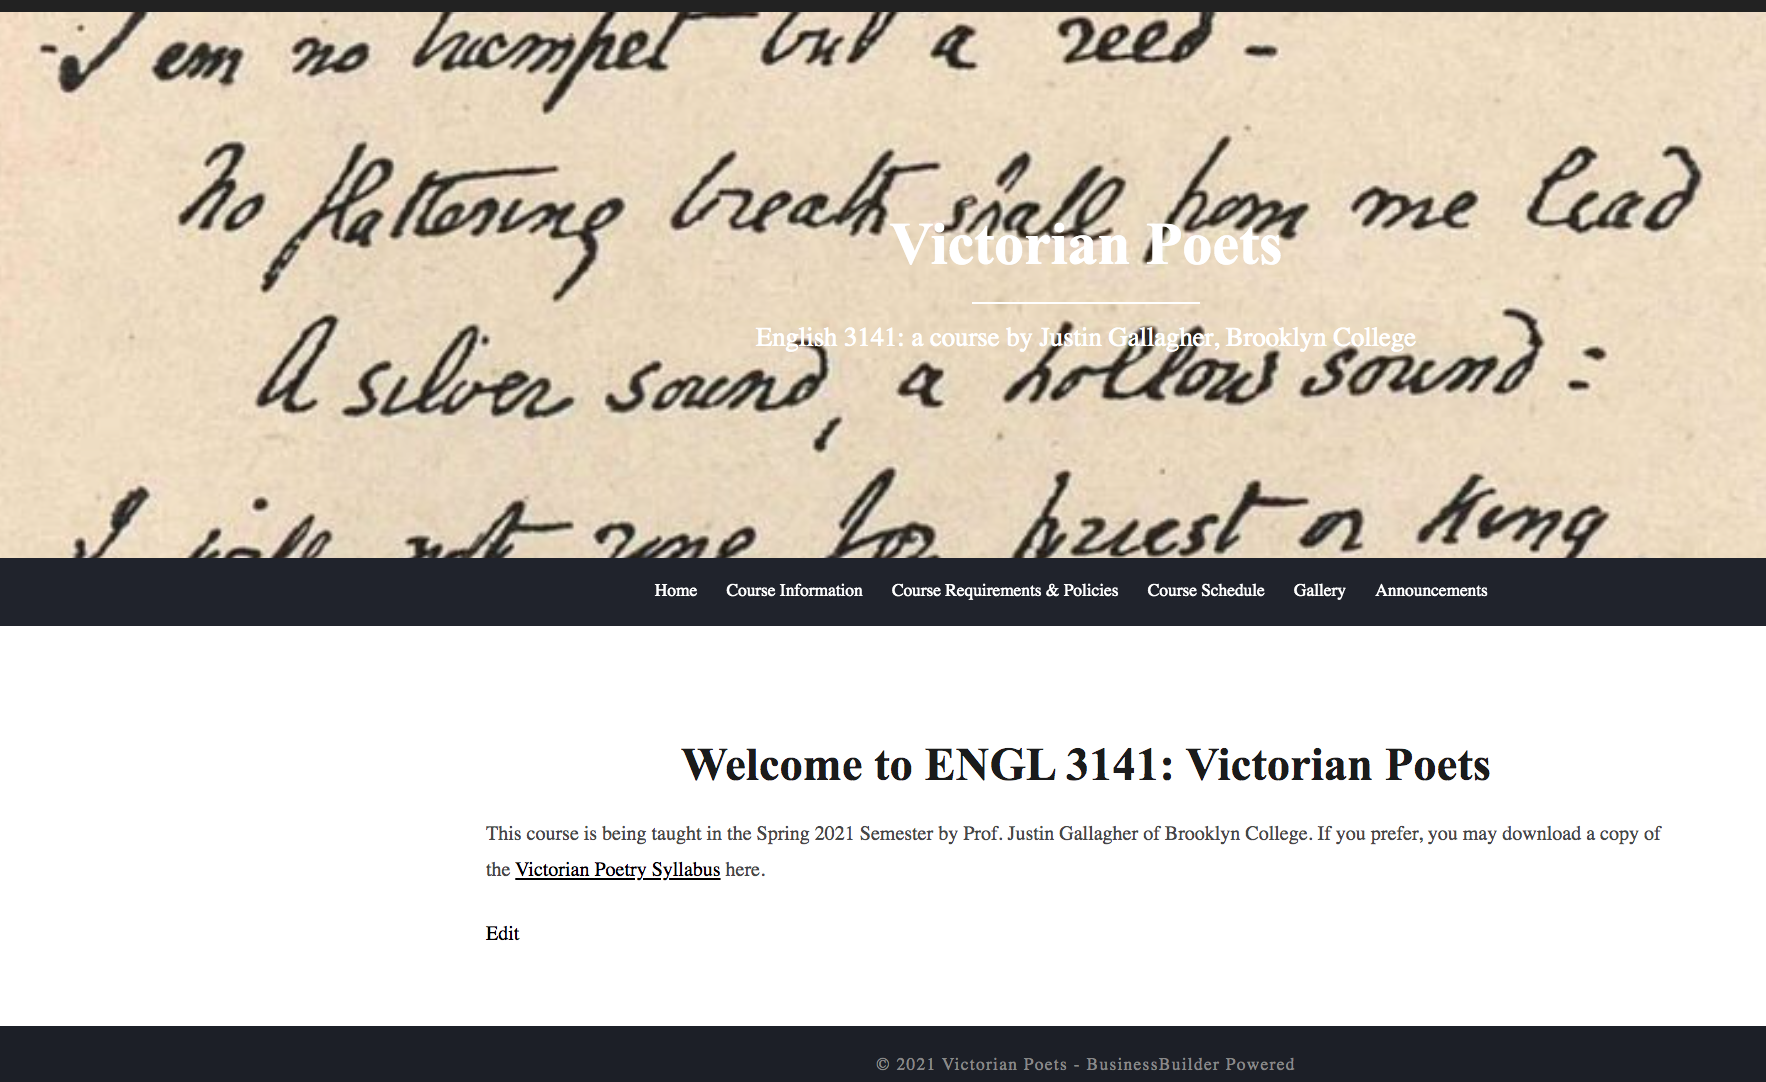 ENGL 3141: Victorian Poets